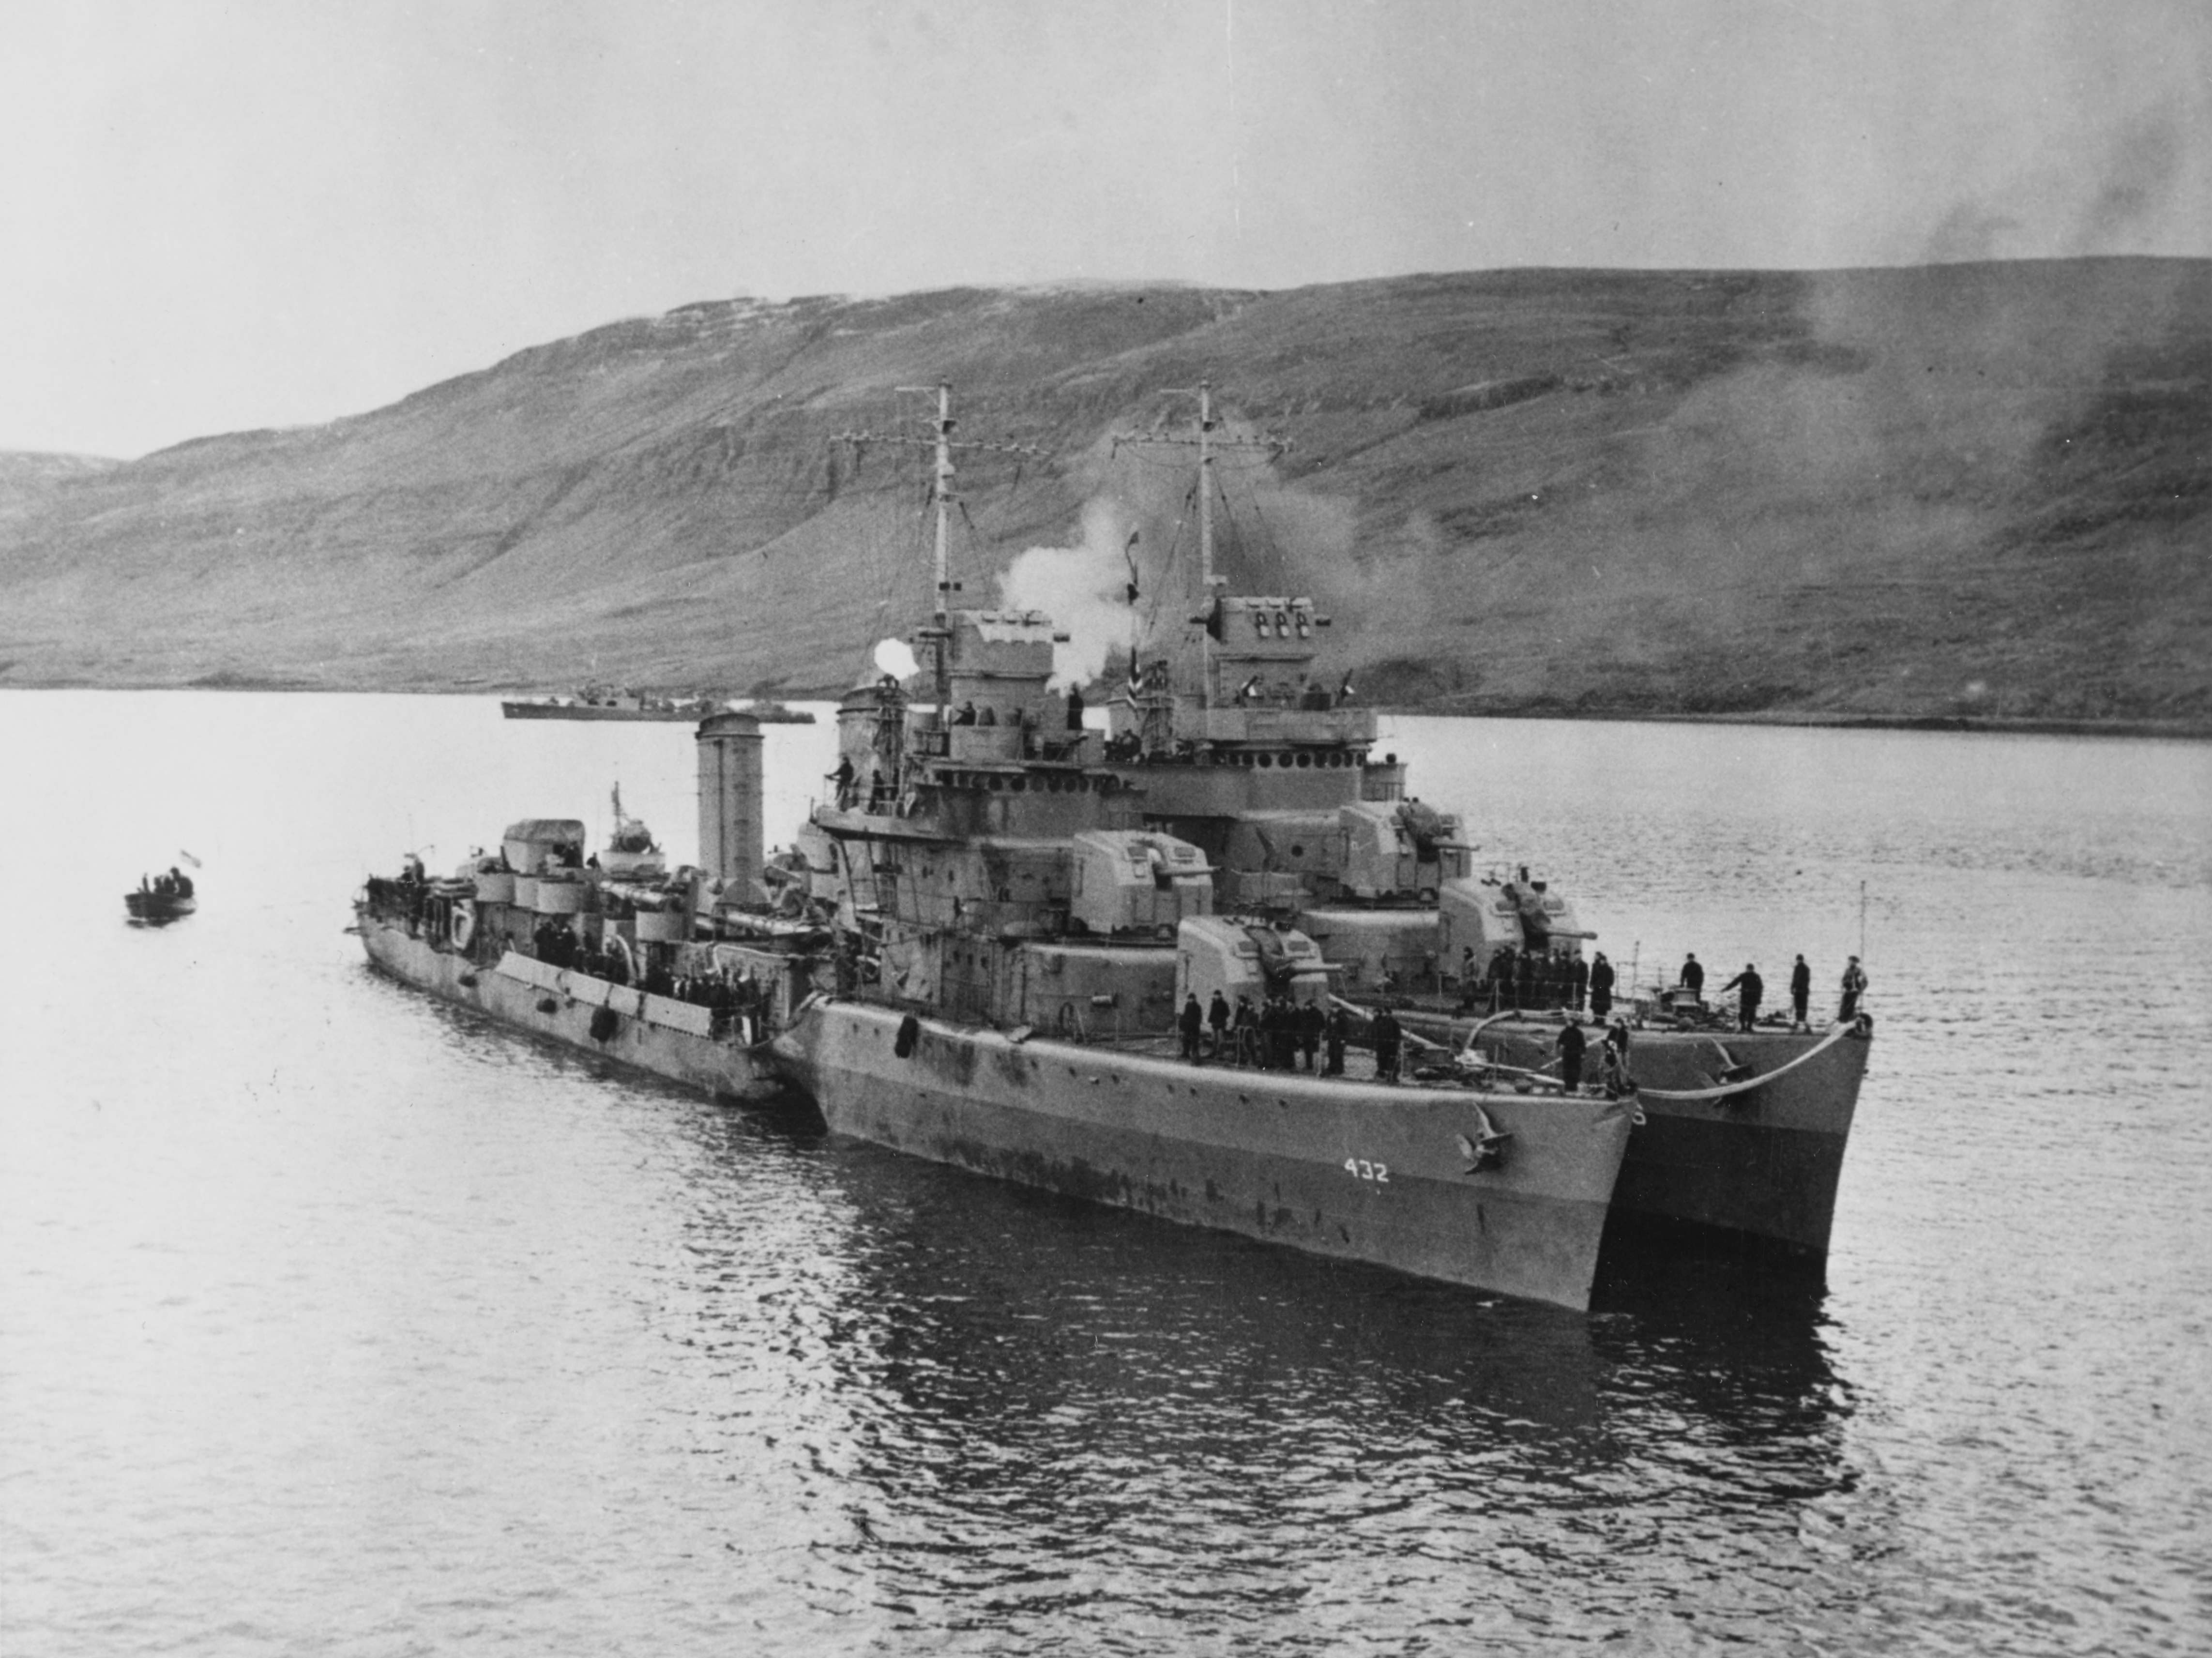 Kearny after she had been torpedoed by German submarine U-568.